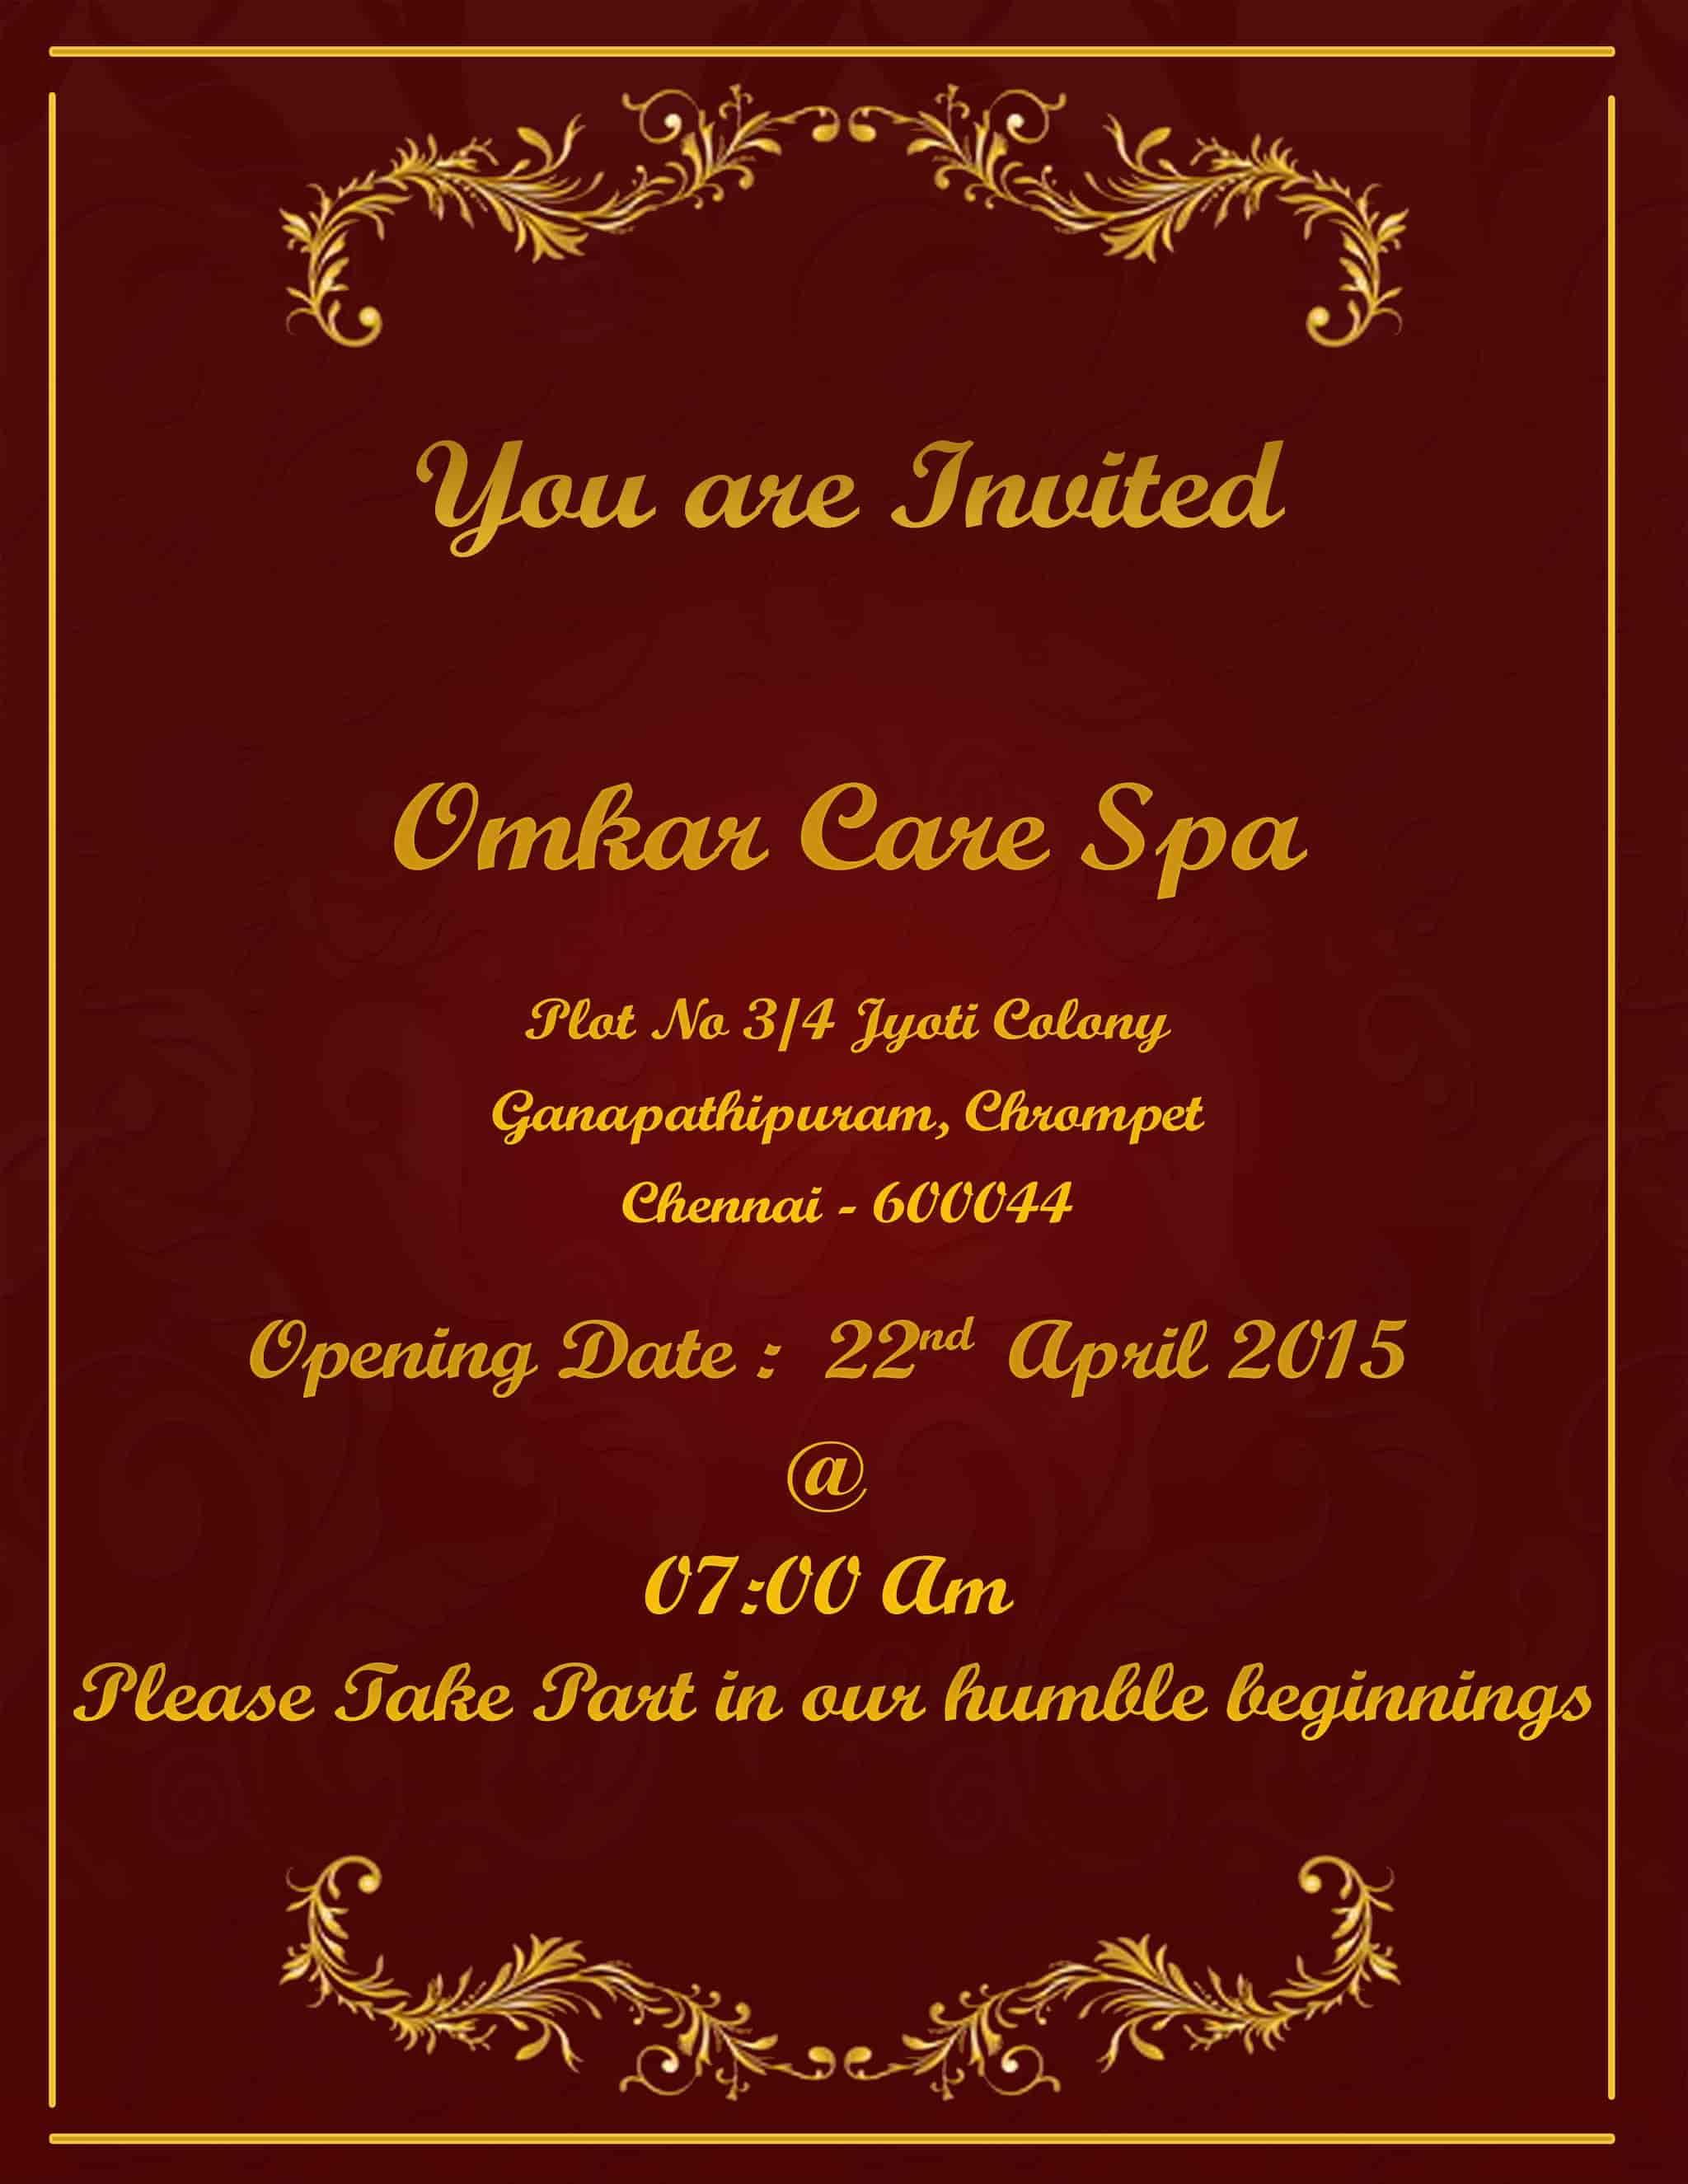 Omkar Care, Chrompet - Omkaar Care - Car Washing Services in Chennai ...